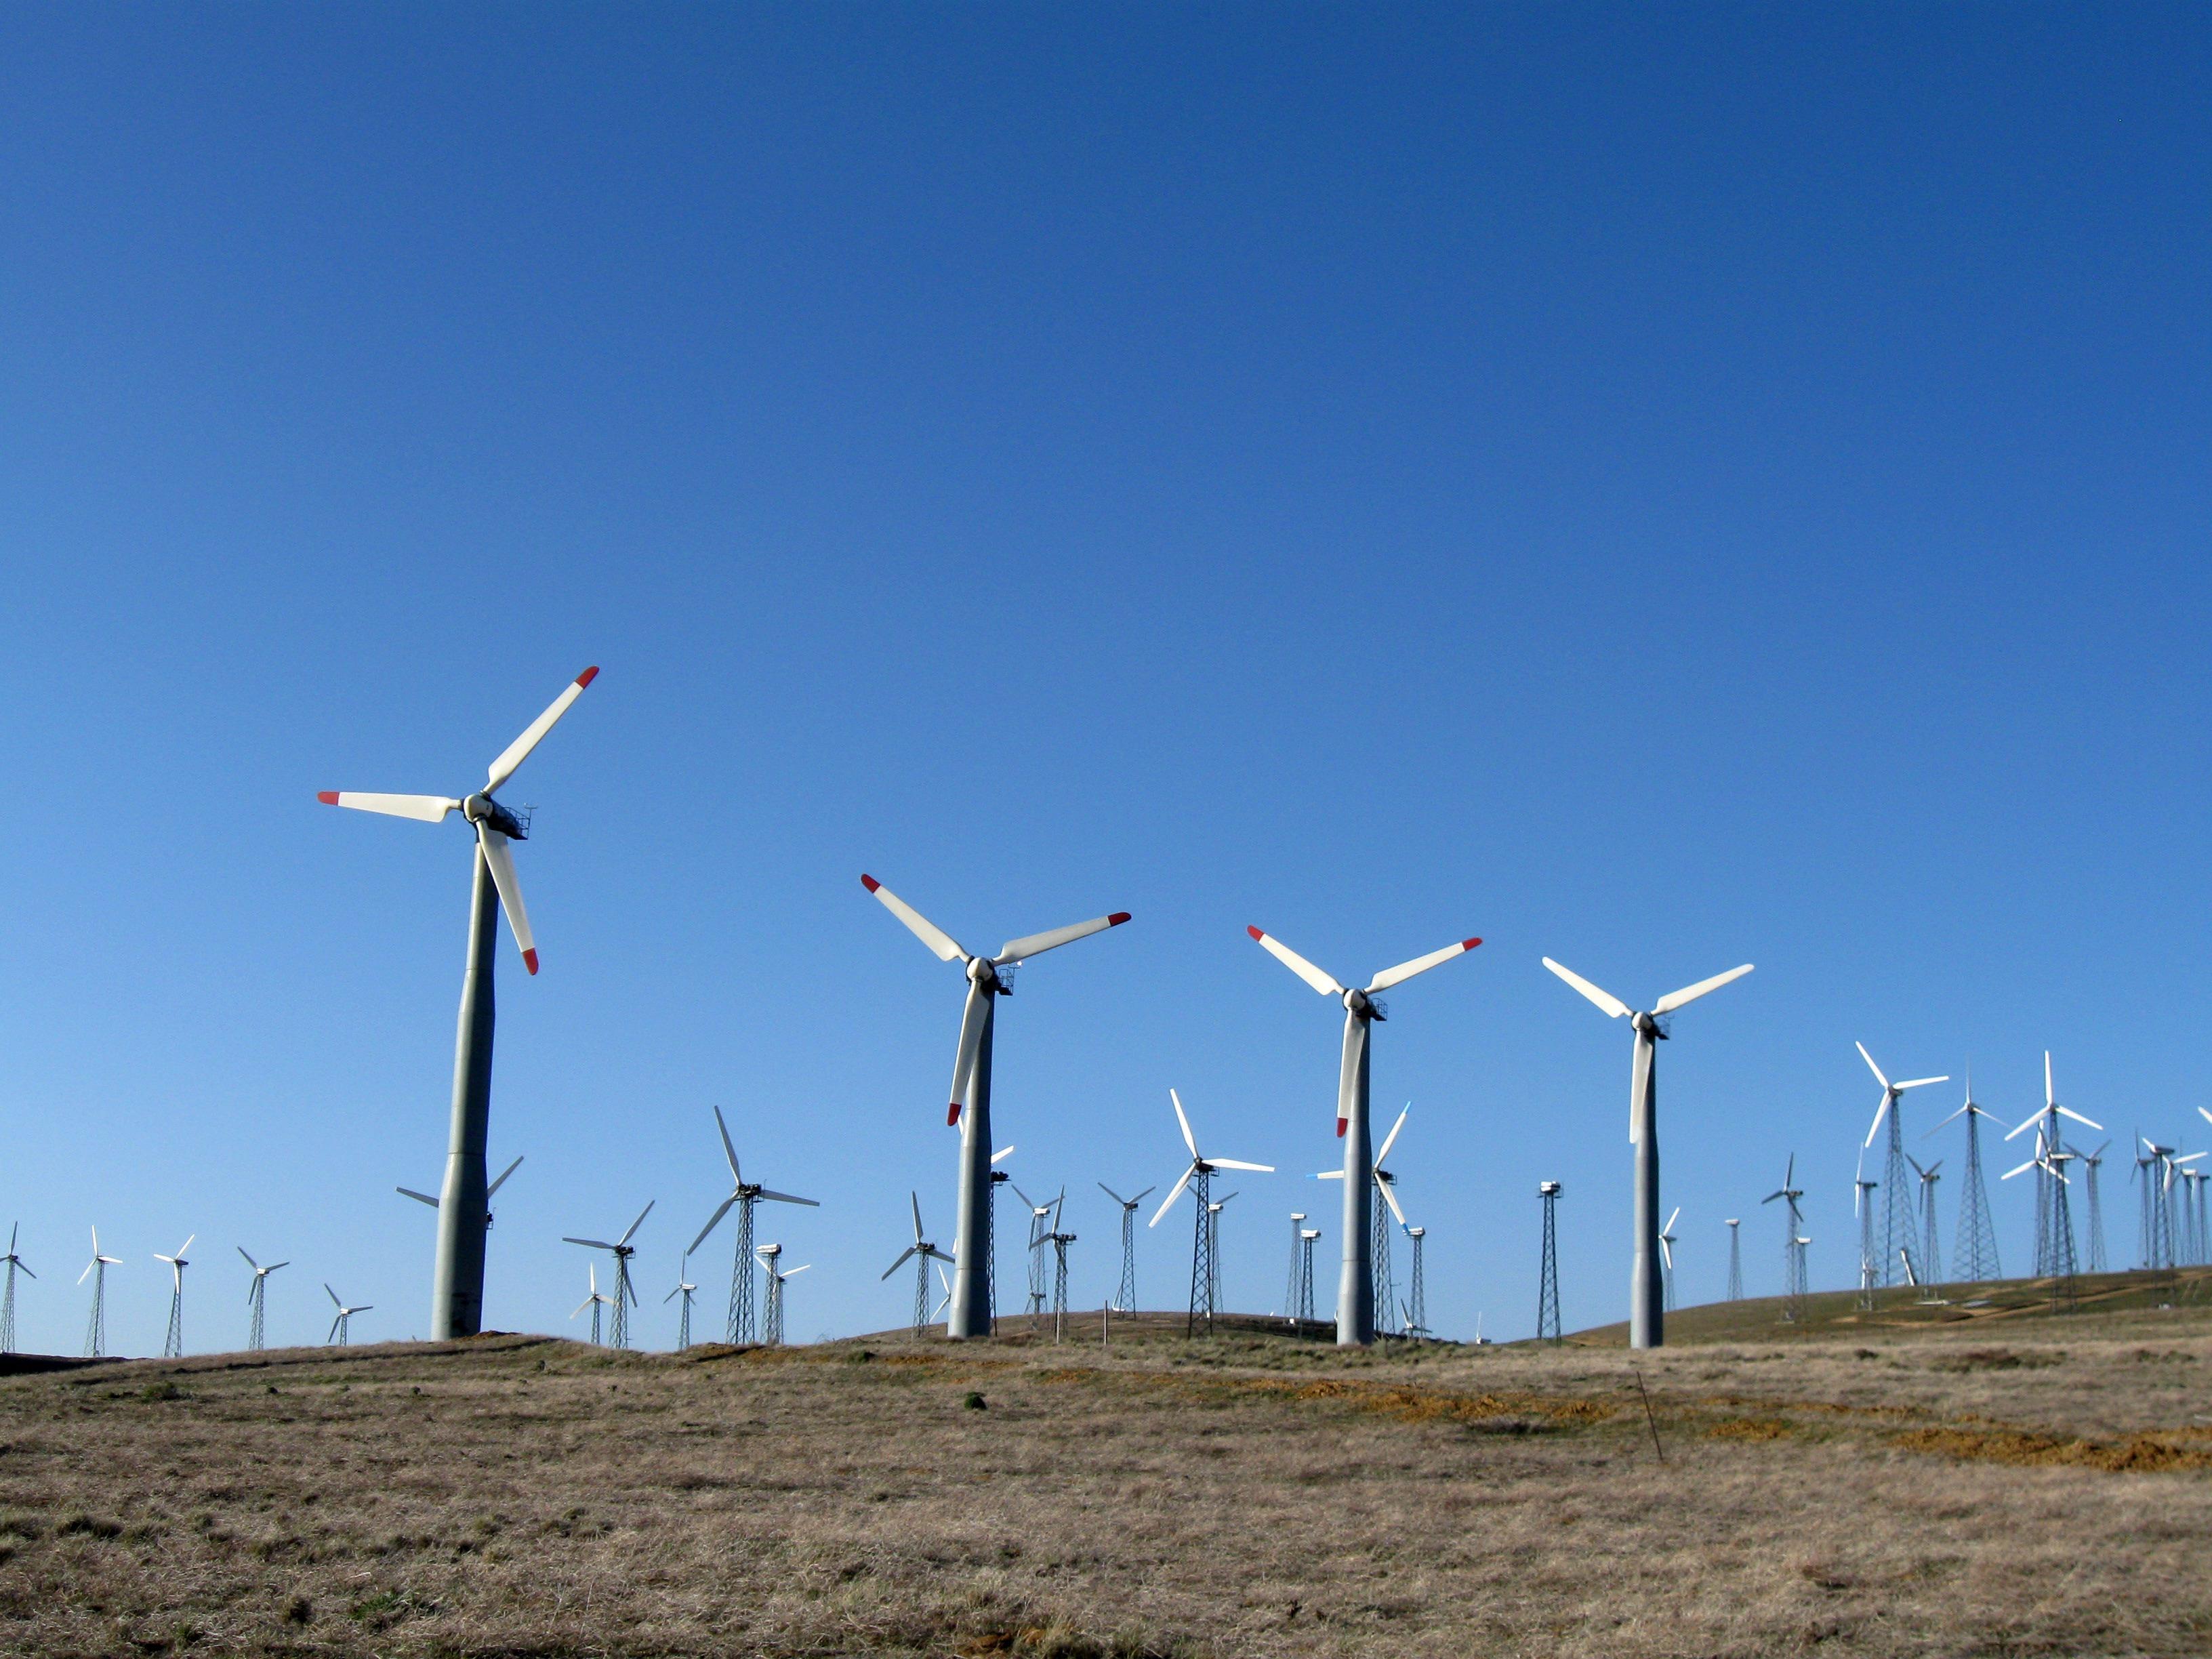 Tehachapi Pass Wind Farm in California. The 705-megawatt farm is composed of about 5,000 wind turbines